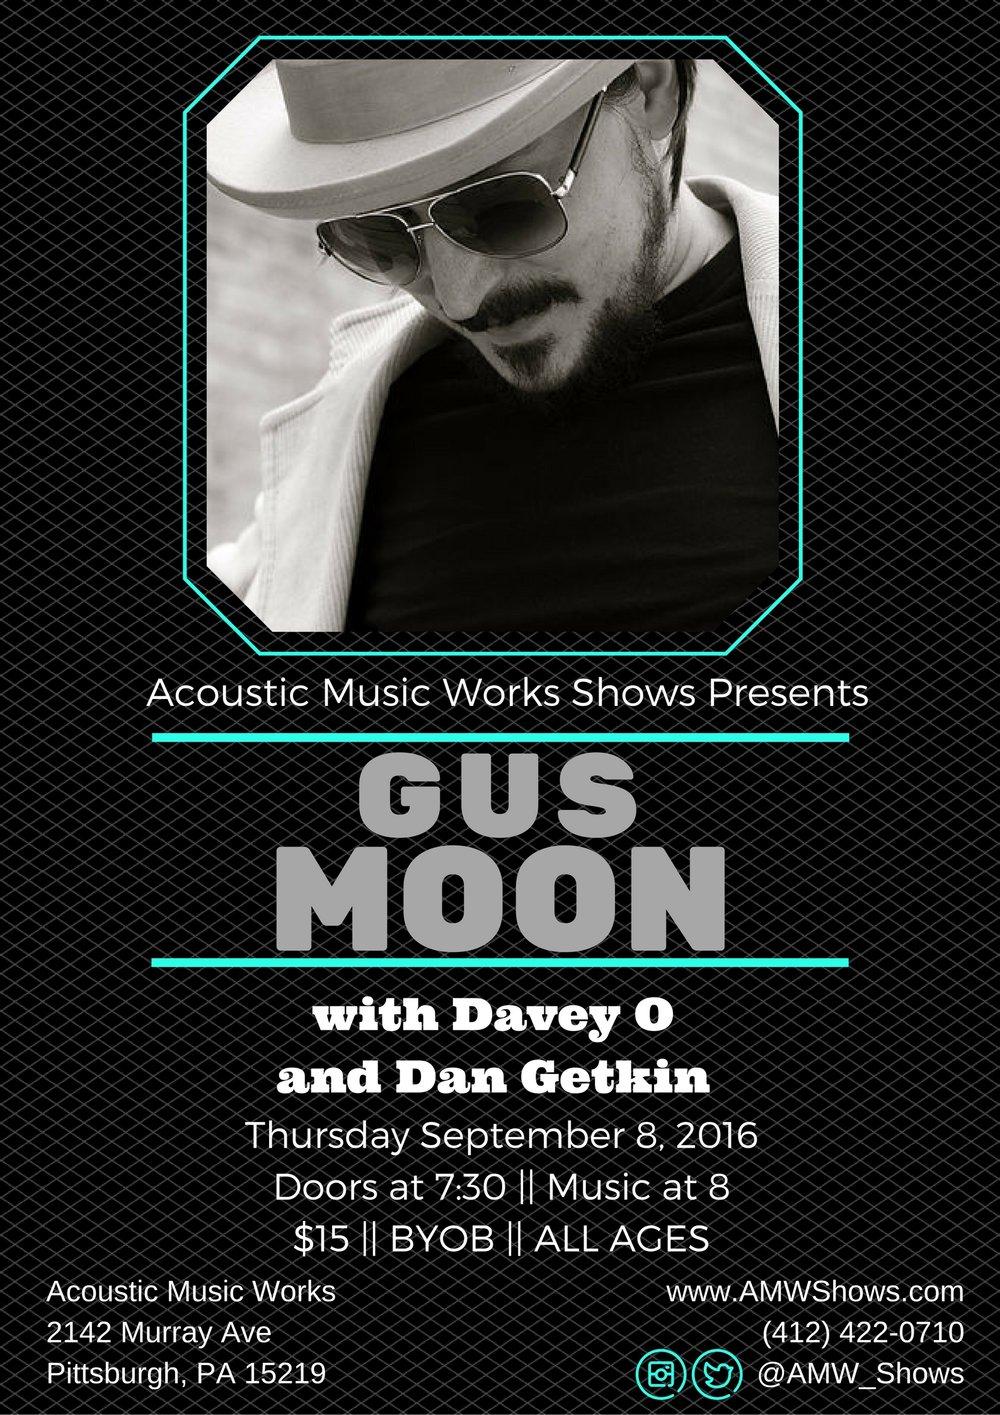 gus moon poster (corrected).jpg